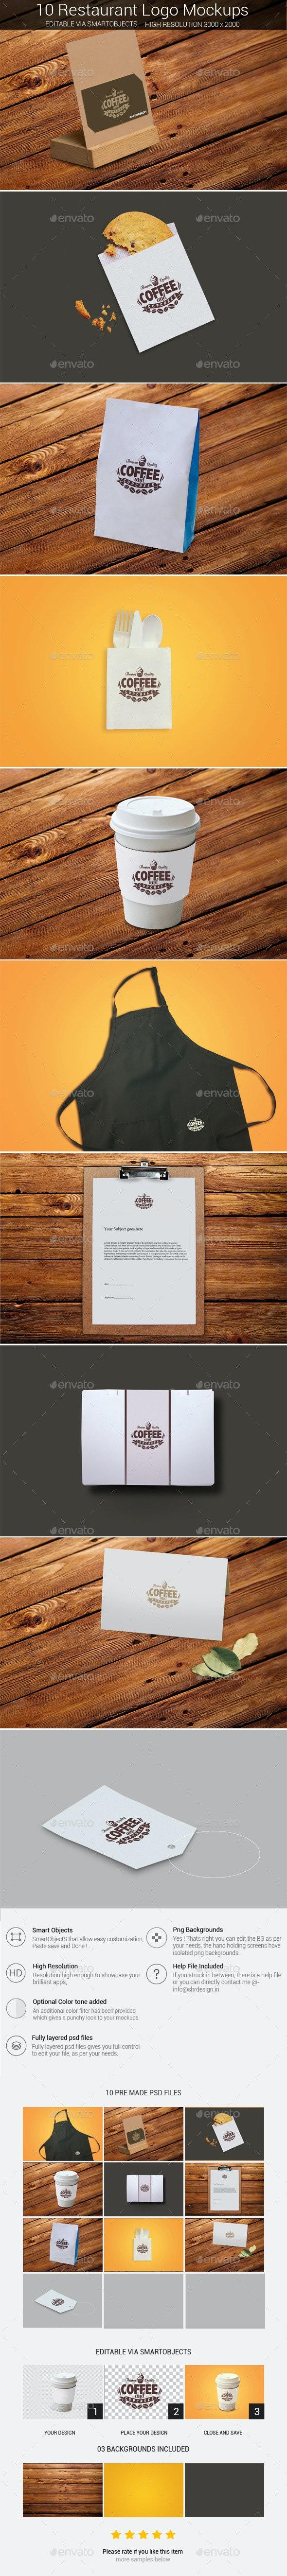 Restaurant Logo Mockup Bundle - Product Mock-Ups Graphics